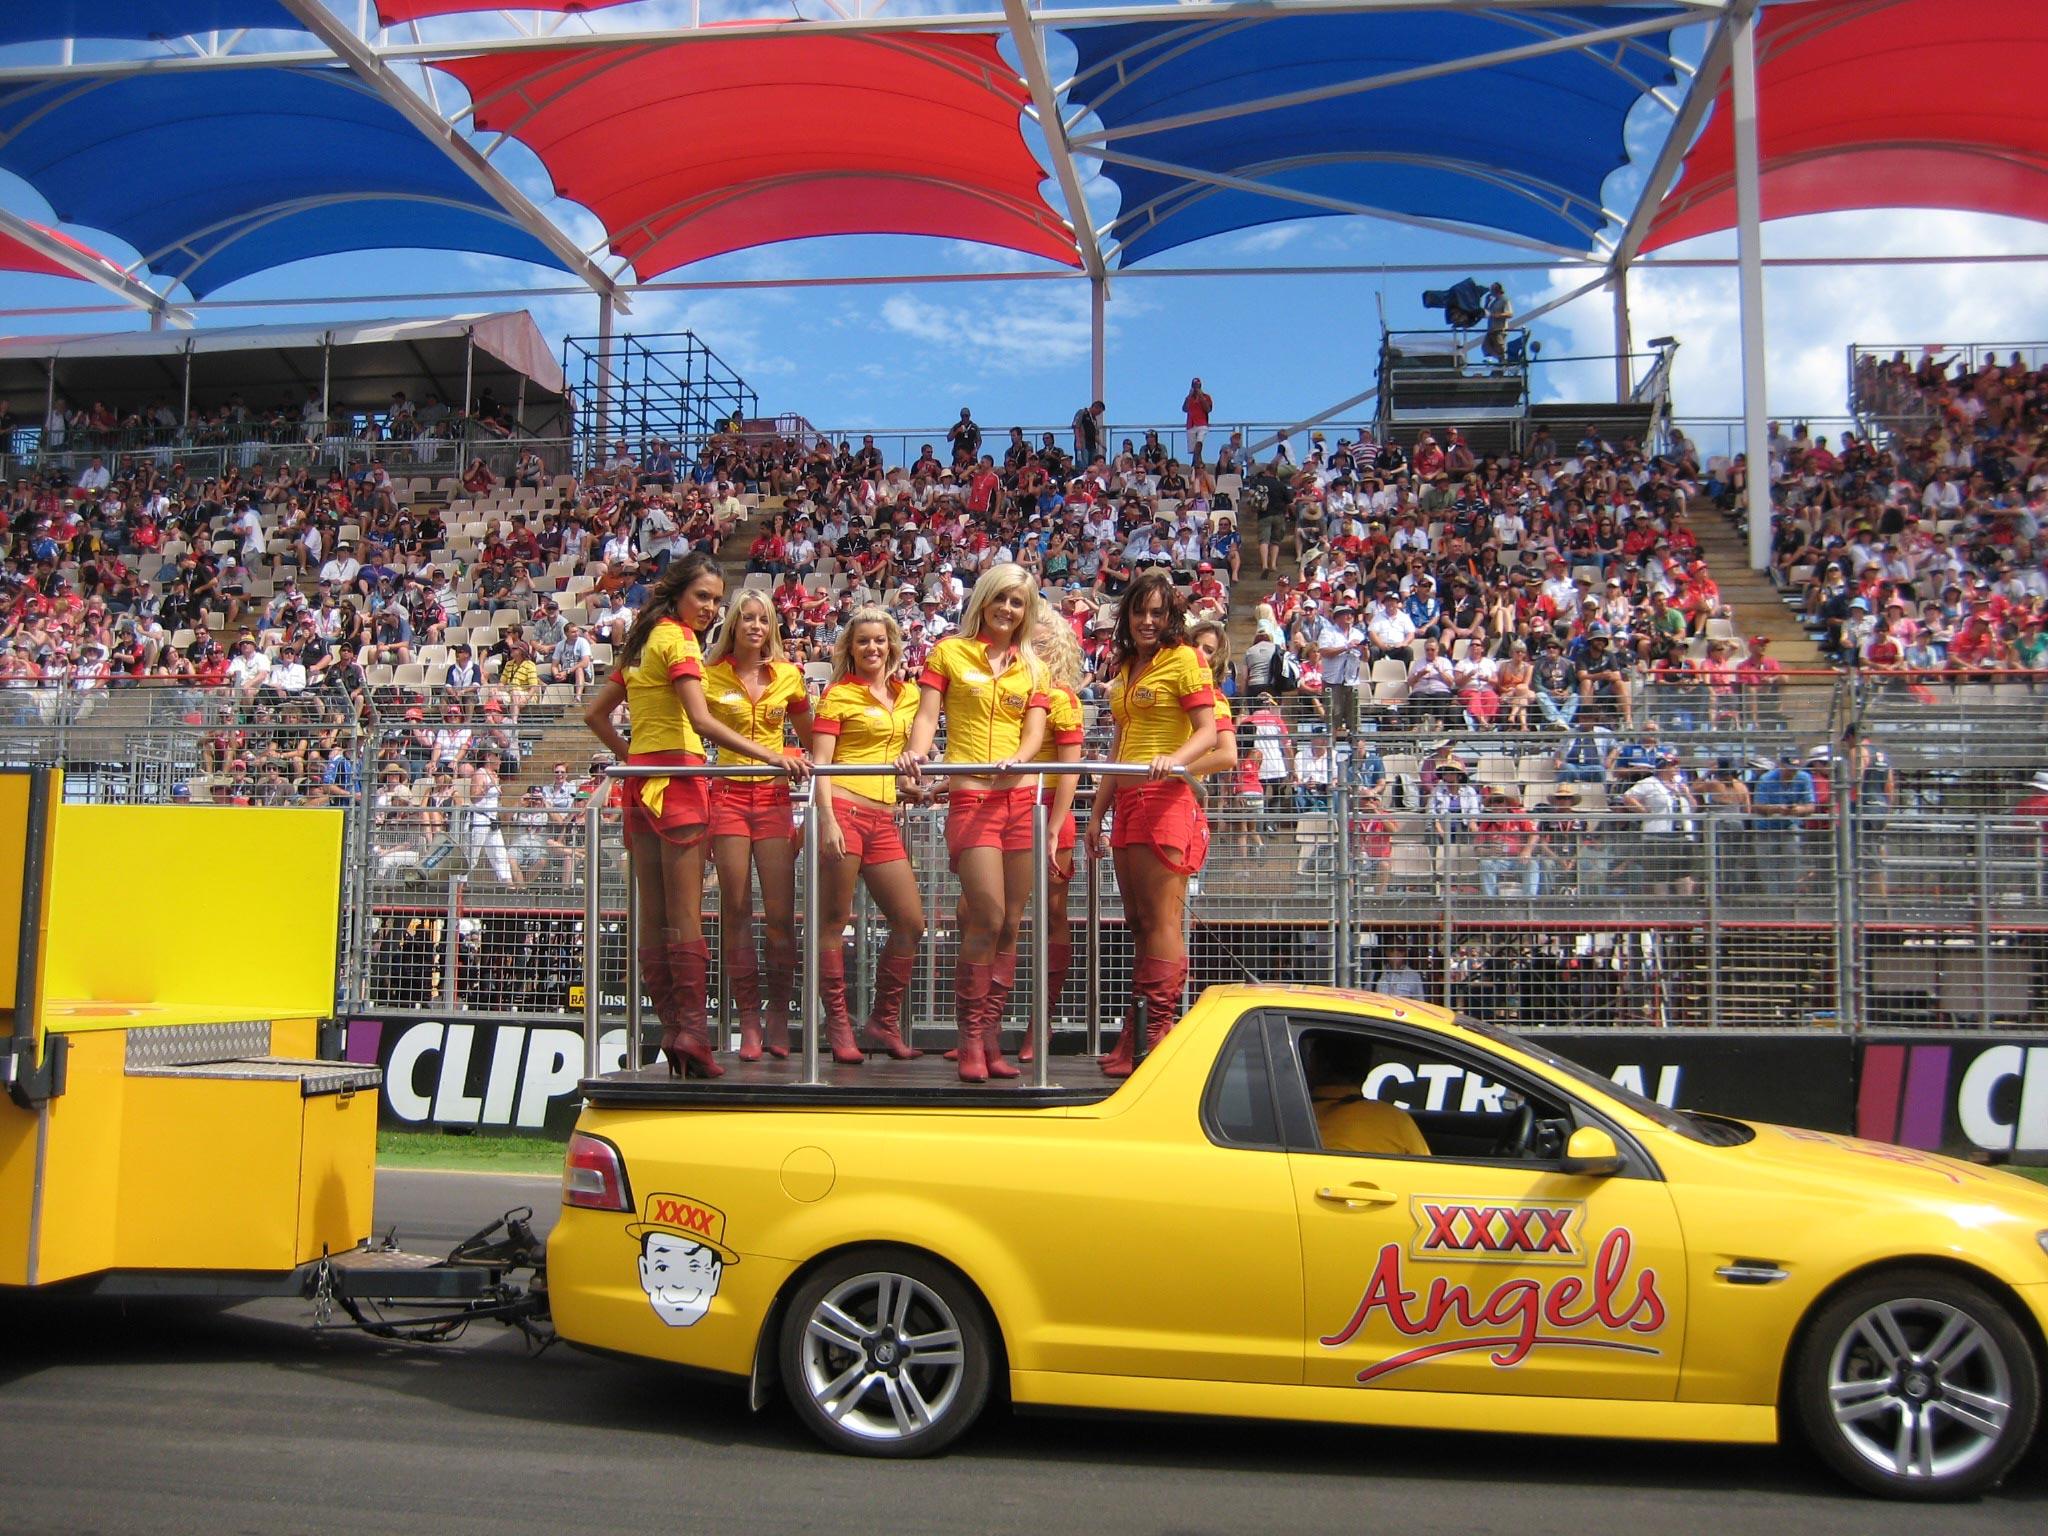 XXXX Gold Retreat V8 Supercars - Modular Event Solutions